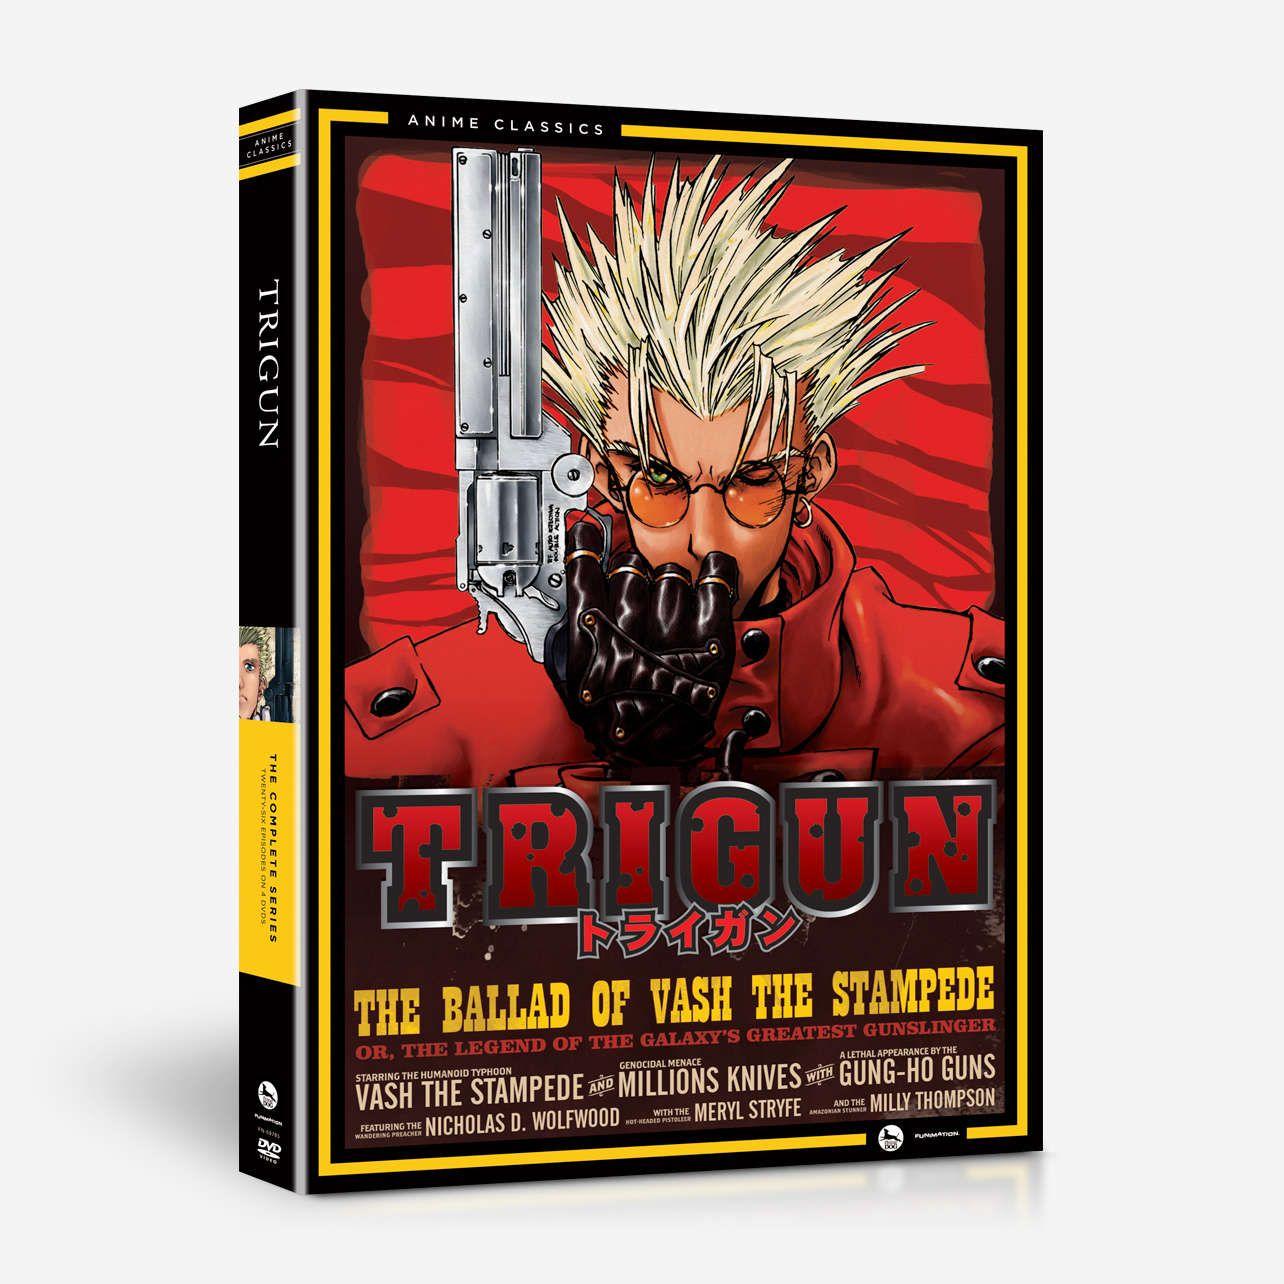 Trigun The Complete Series Anime Classics HomeVideo